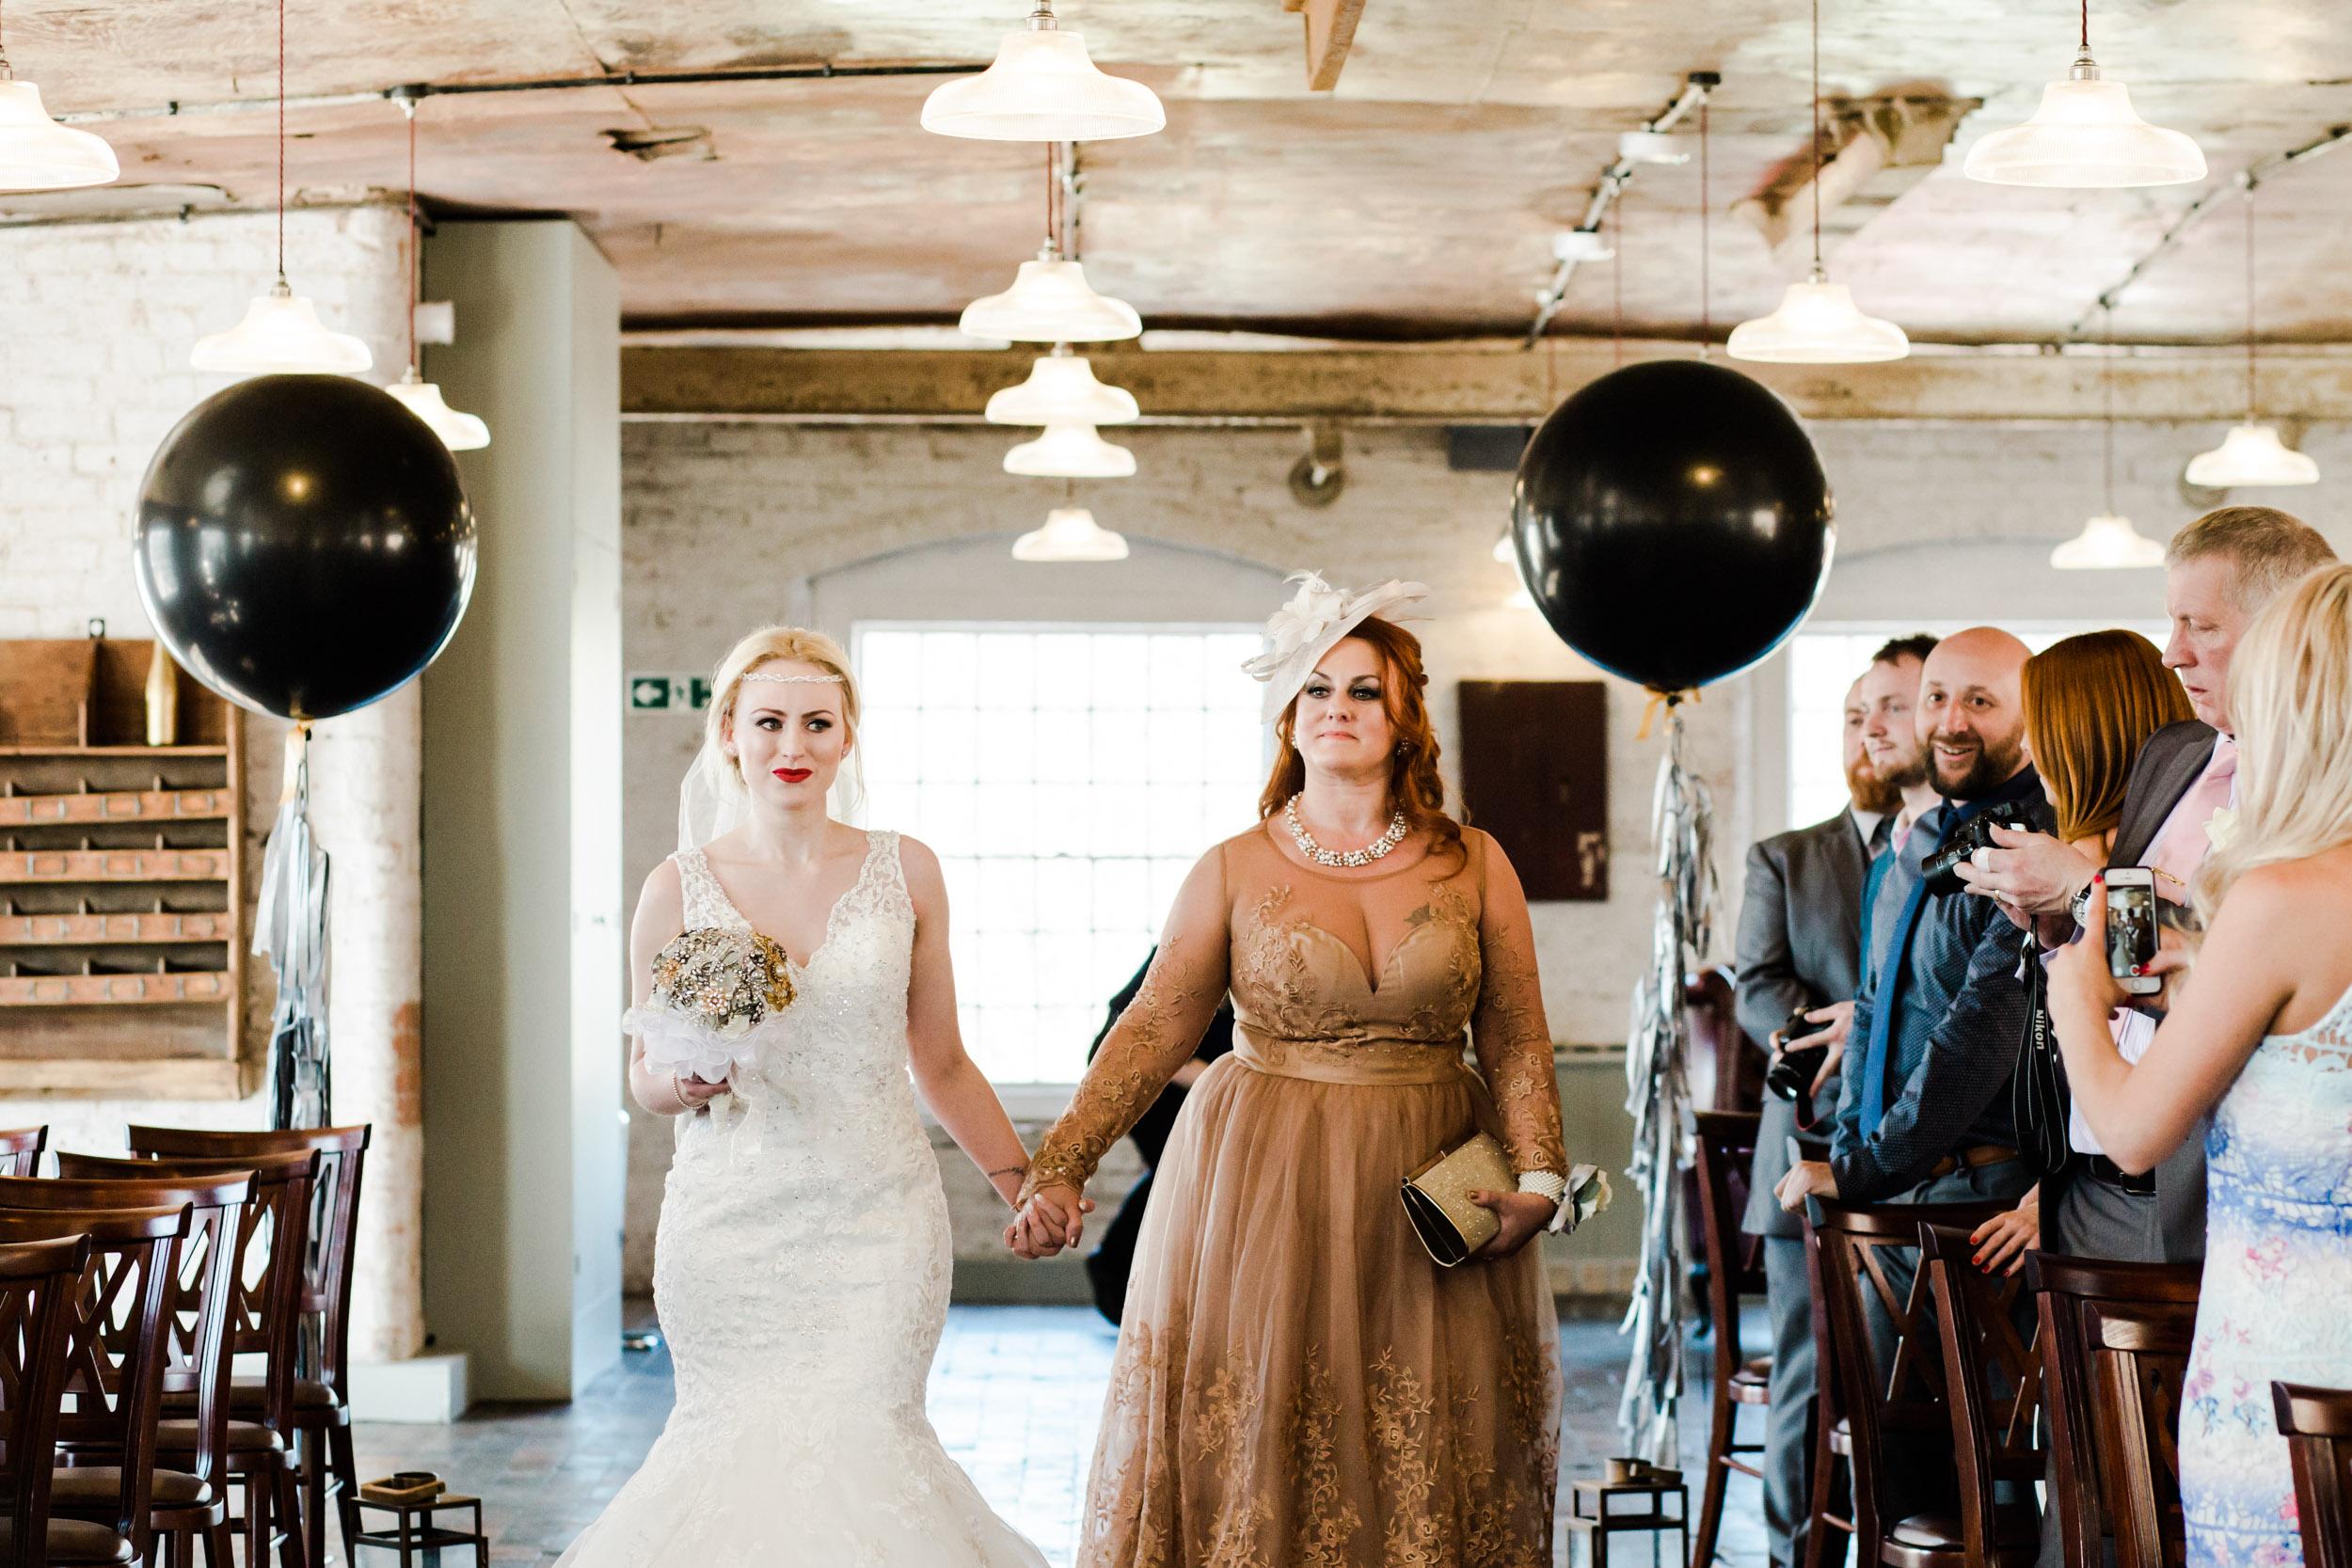 Industrial_glamour_wedding_west_mill_derby73